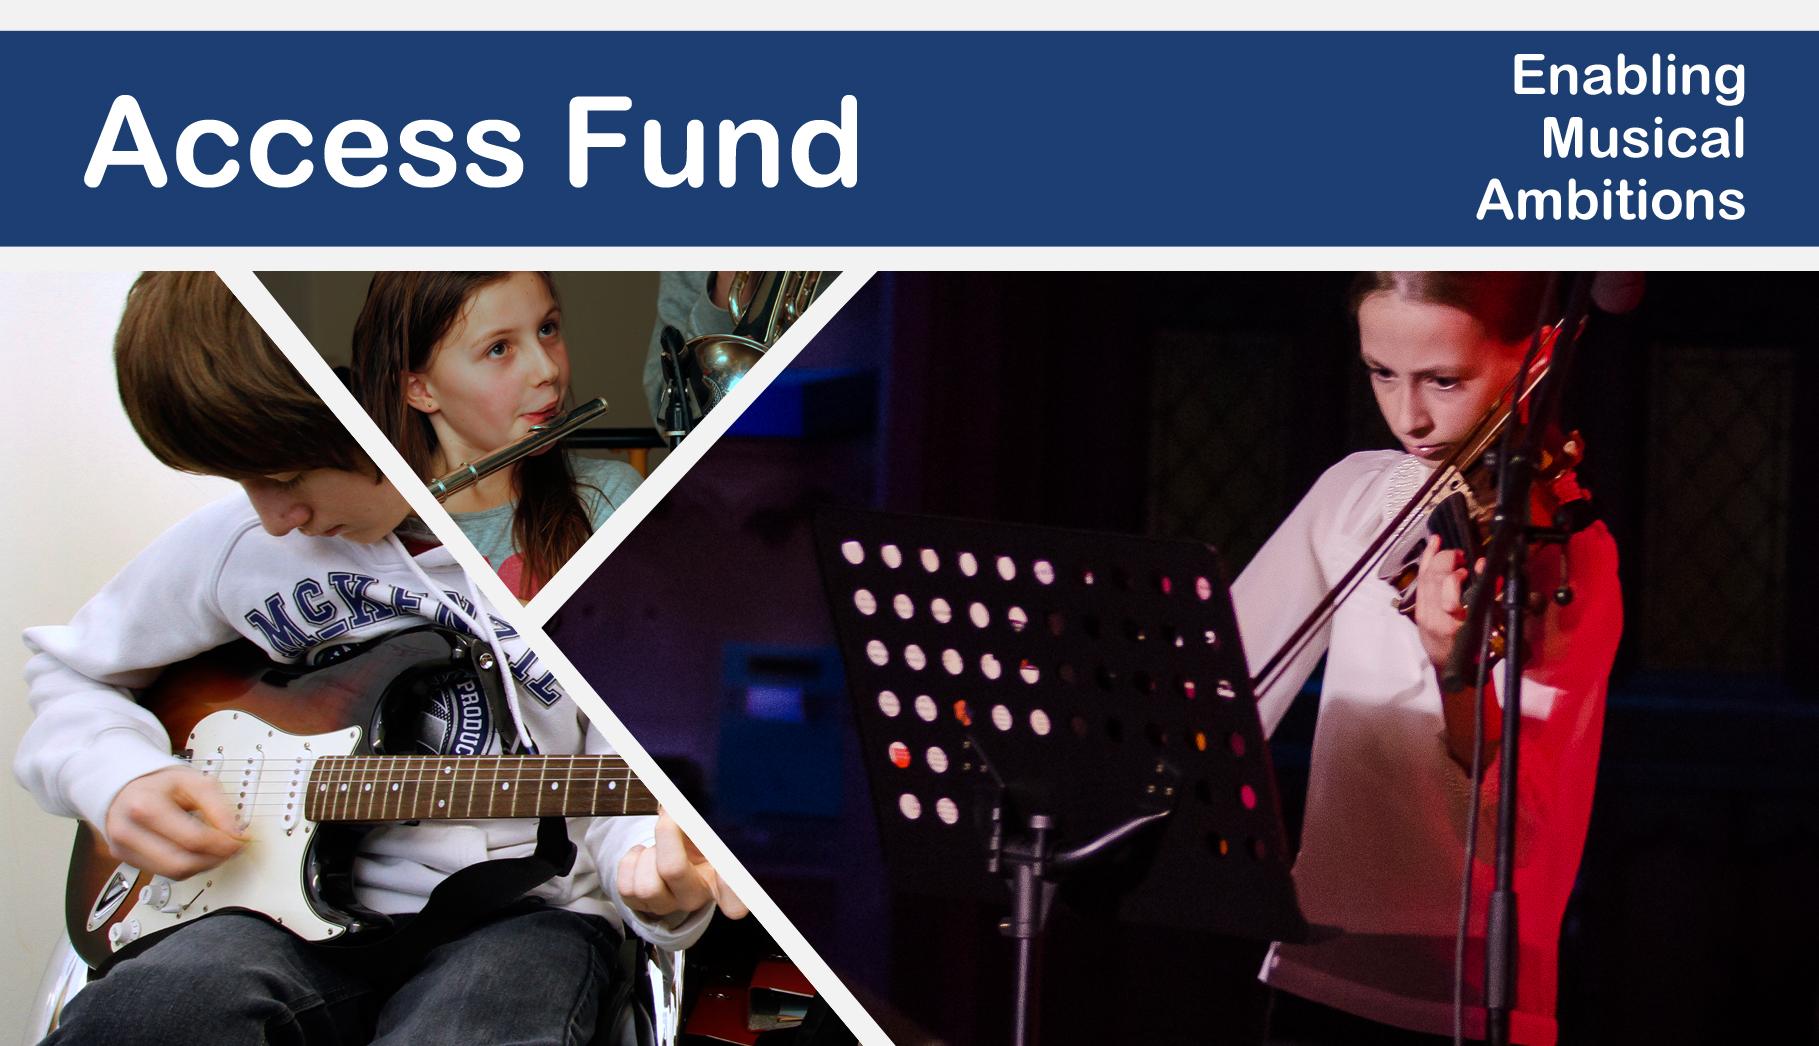 2553Access Fund 2016/17